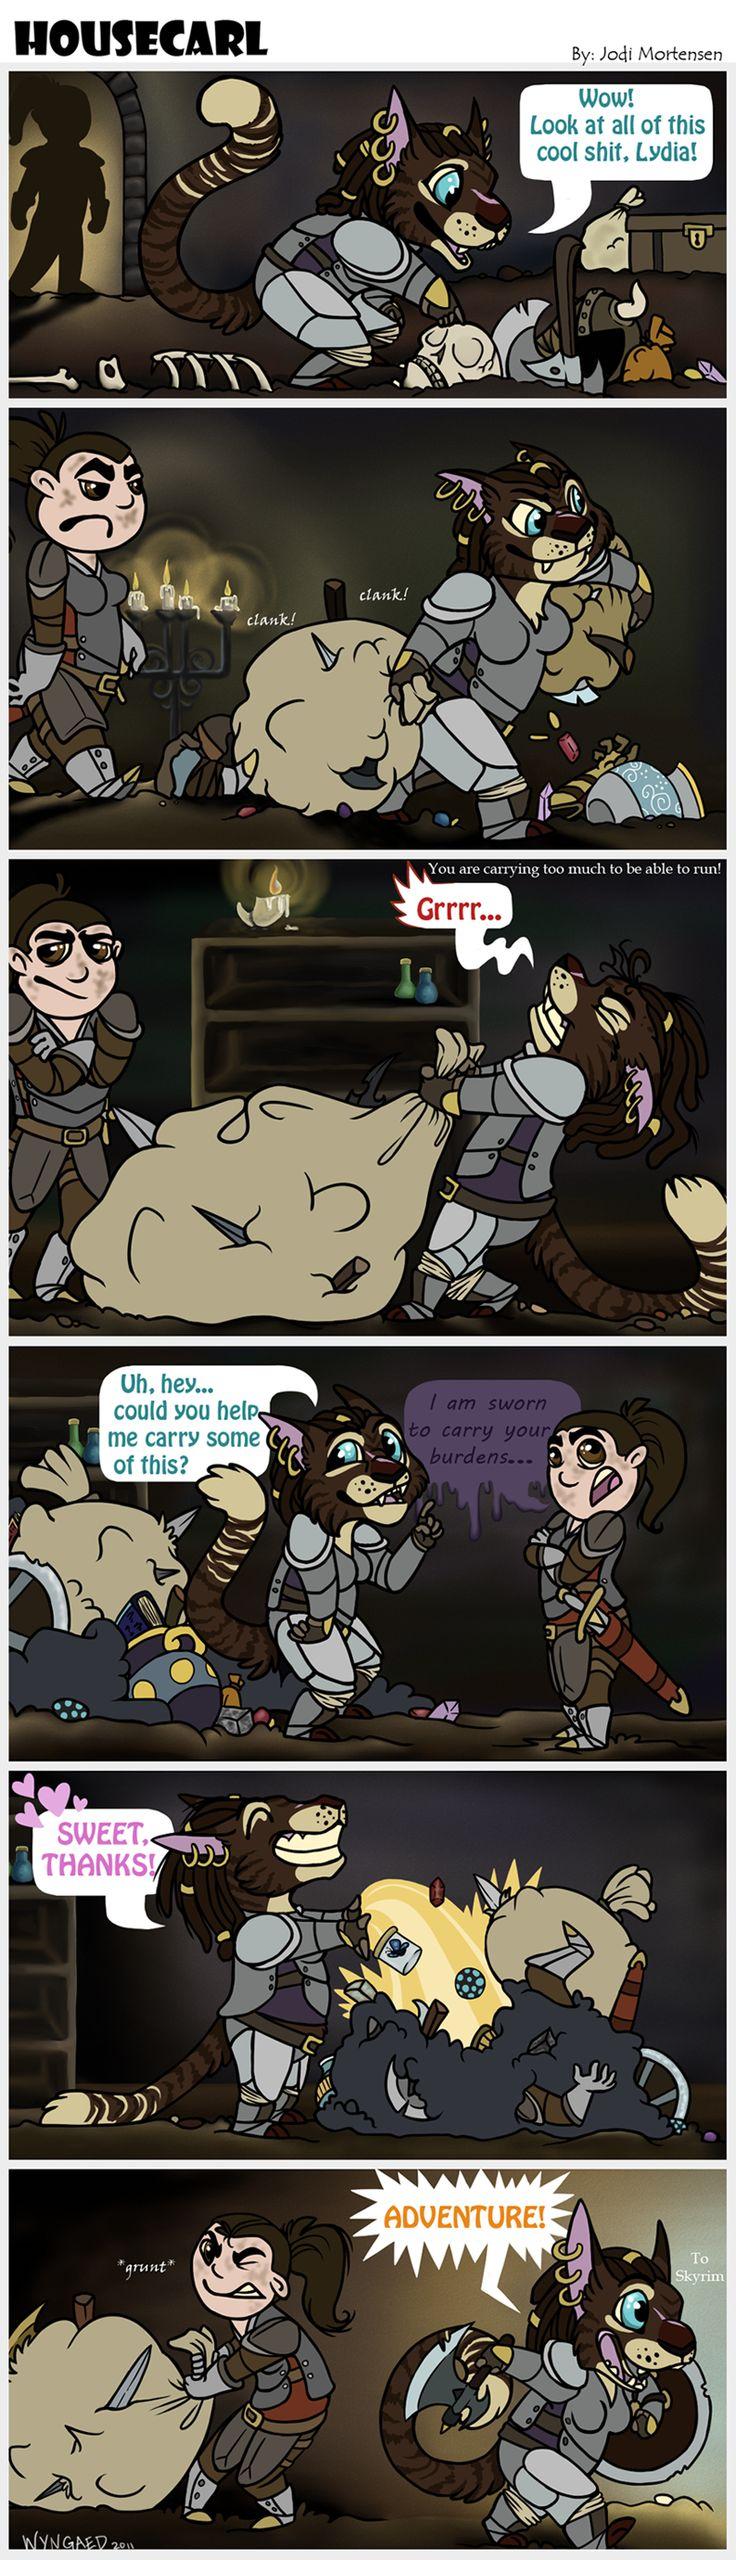 Housecarl - A Skyrim Comic by wyngaed.deviantart.com